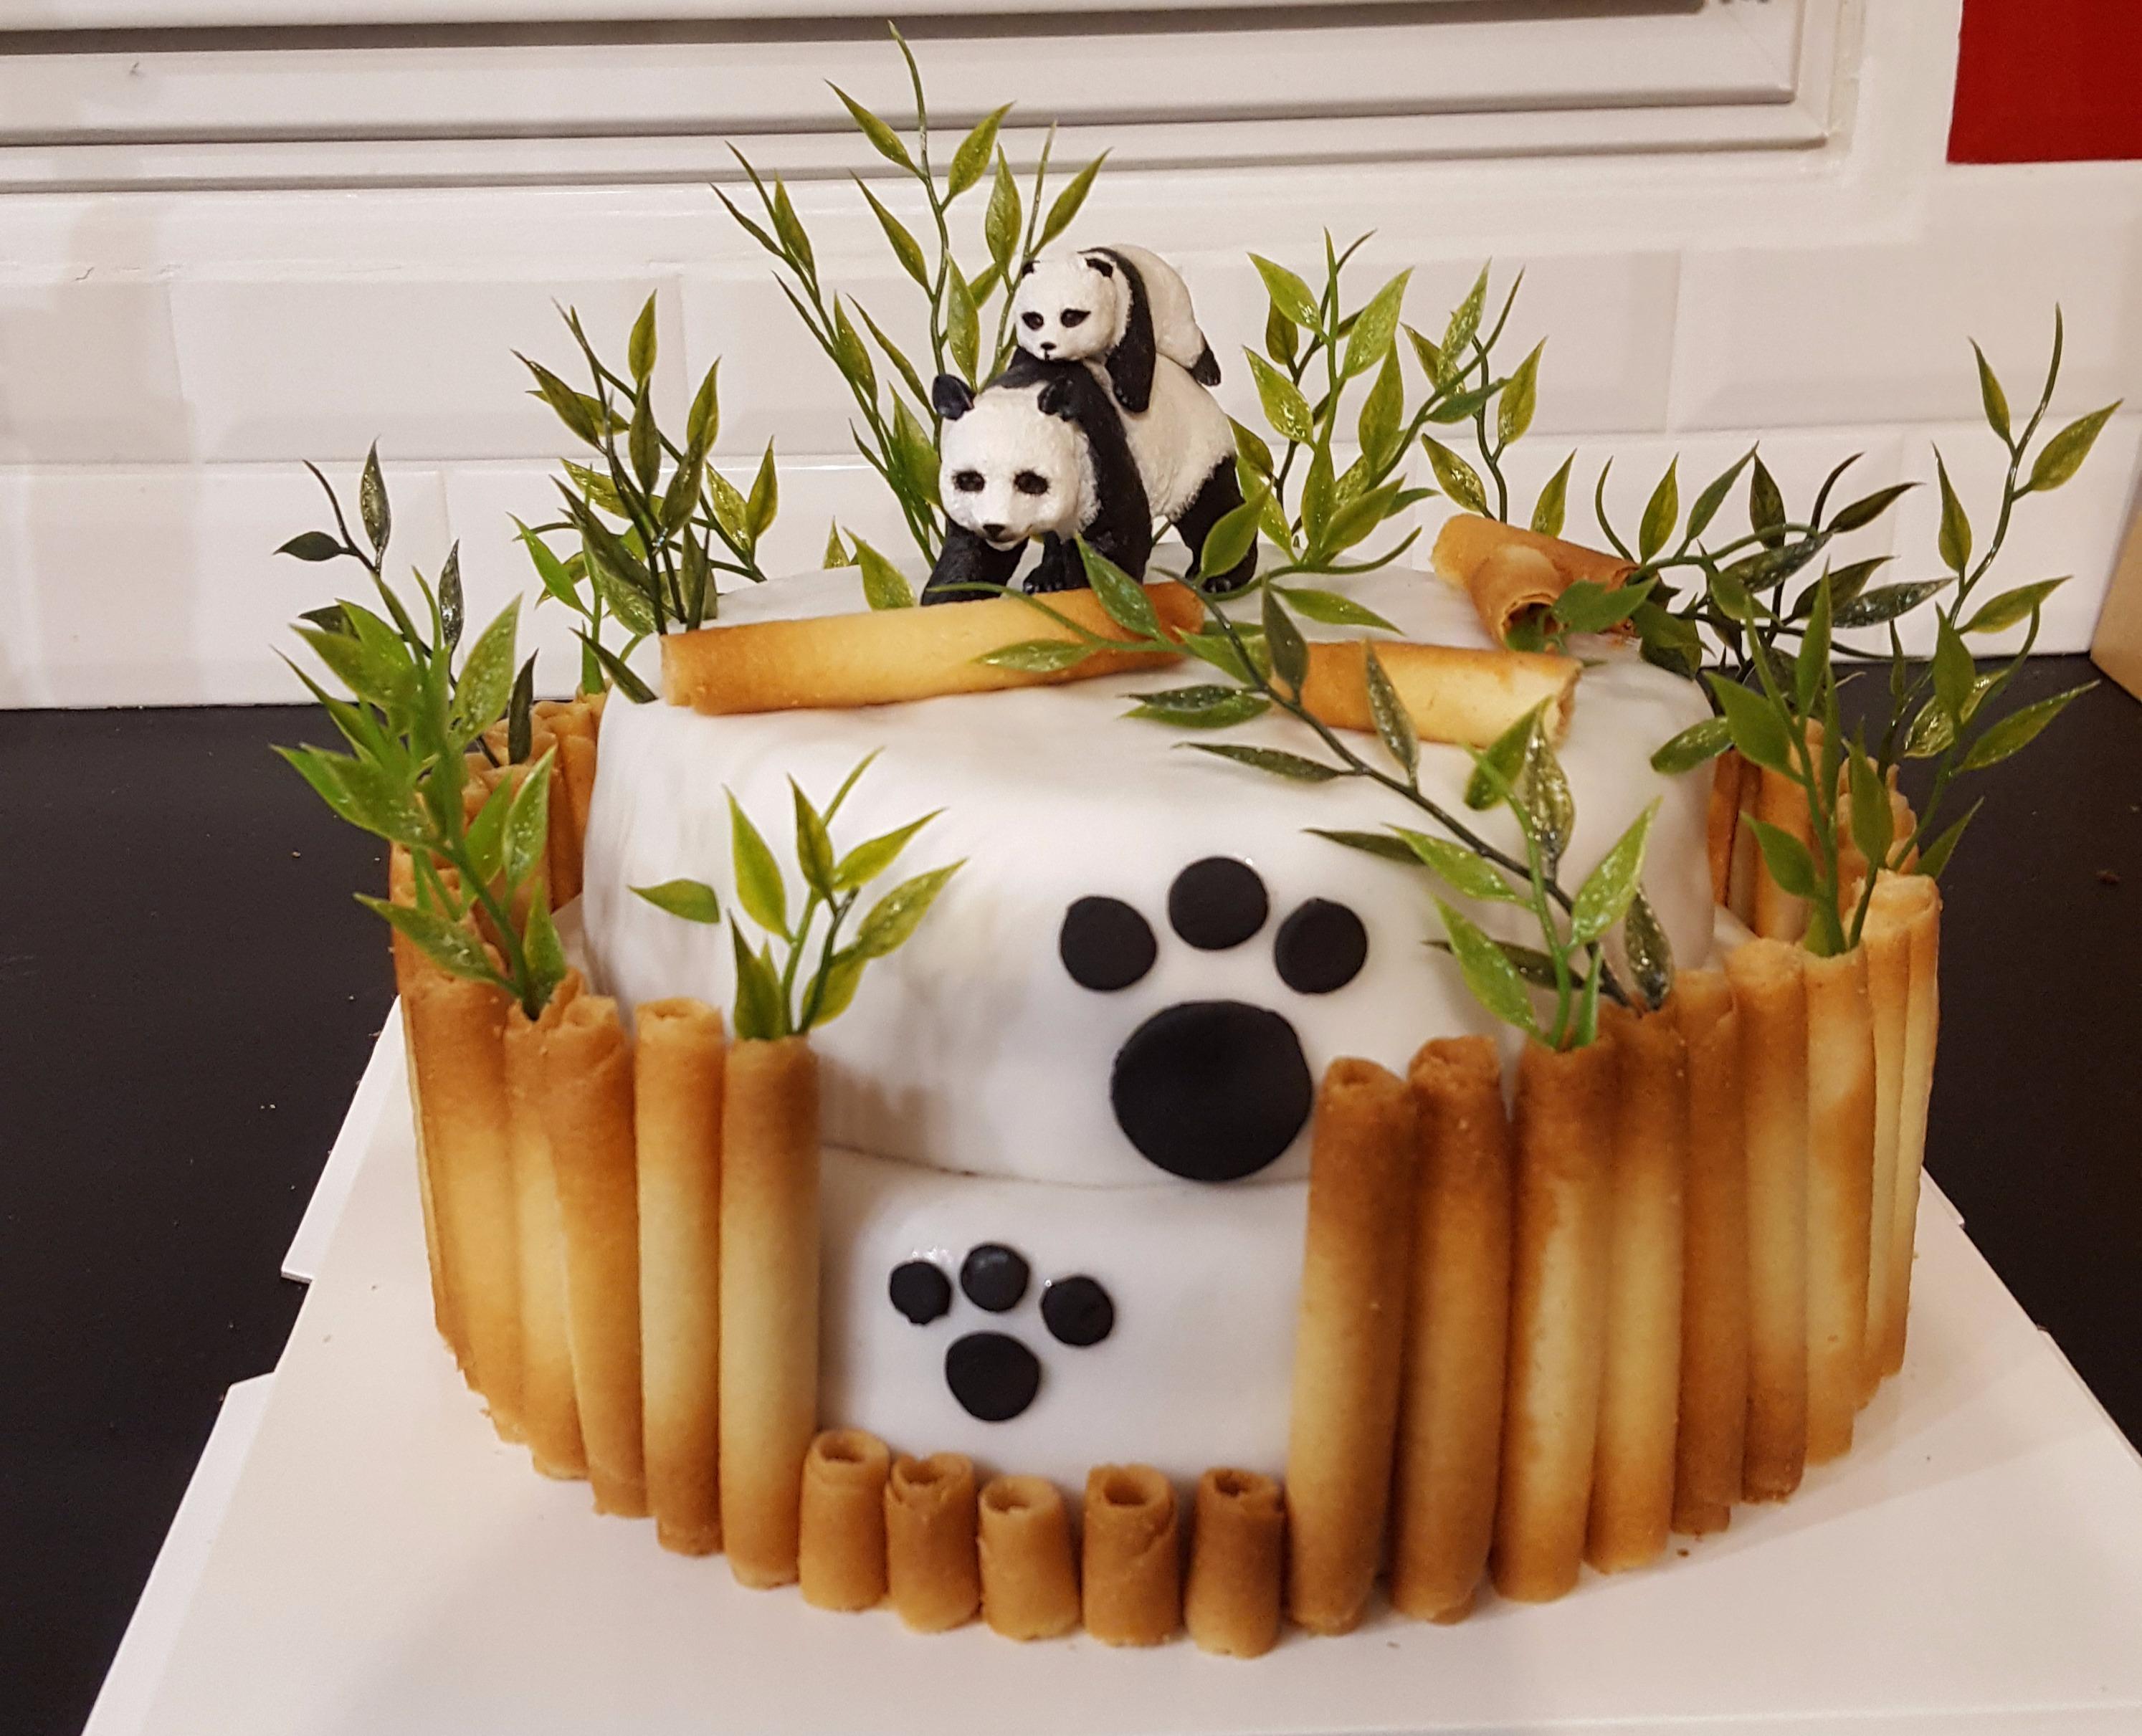 Panda's cake